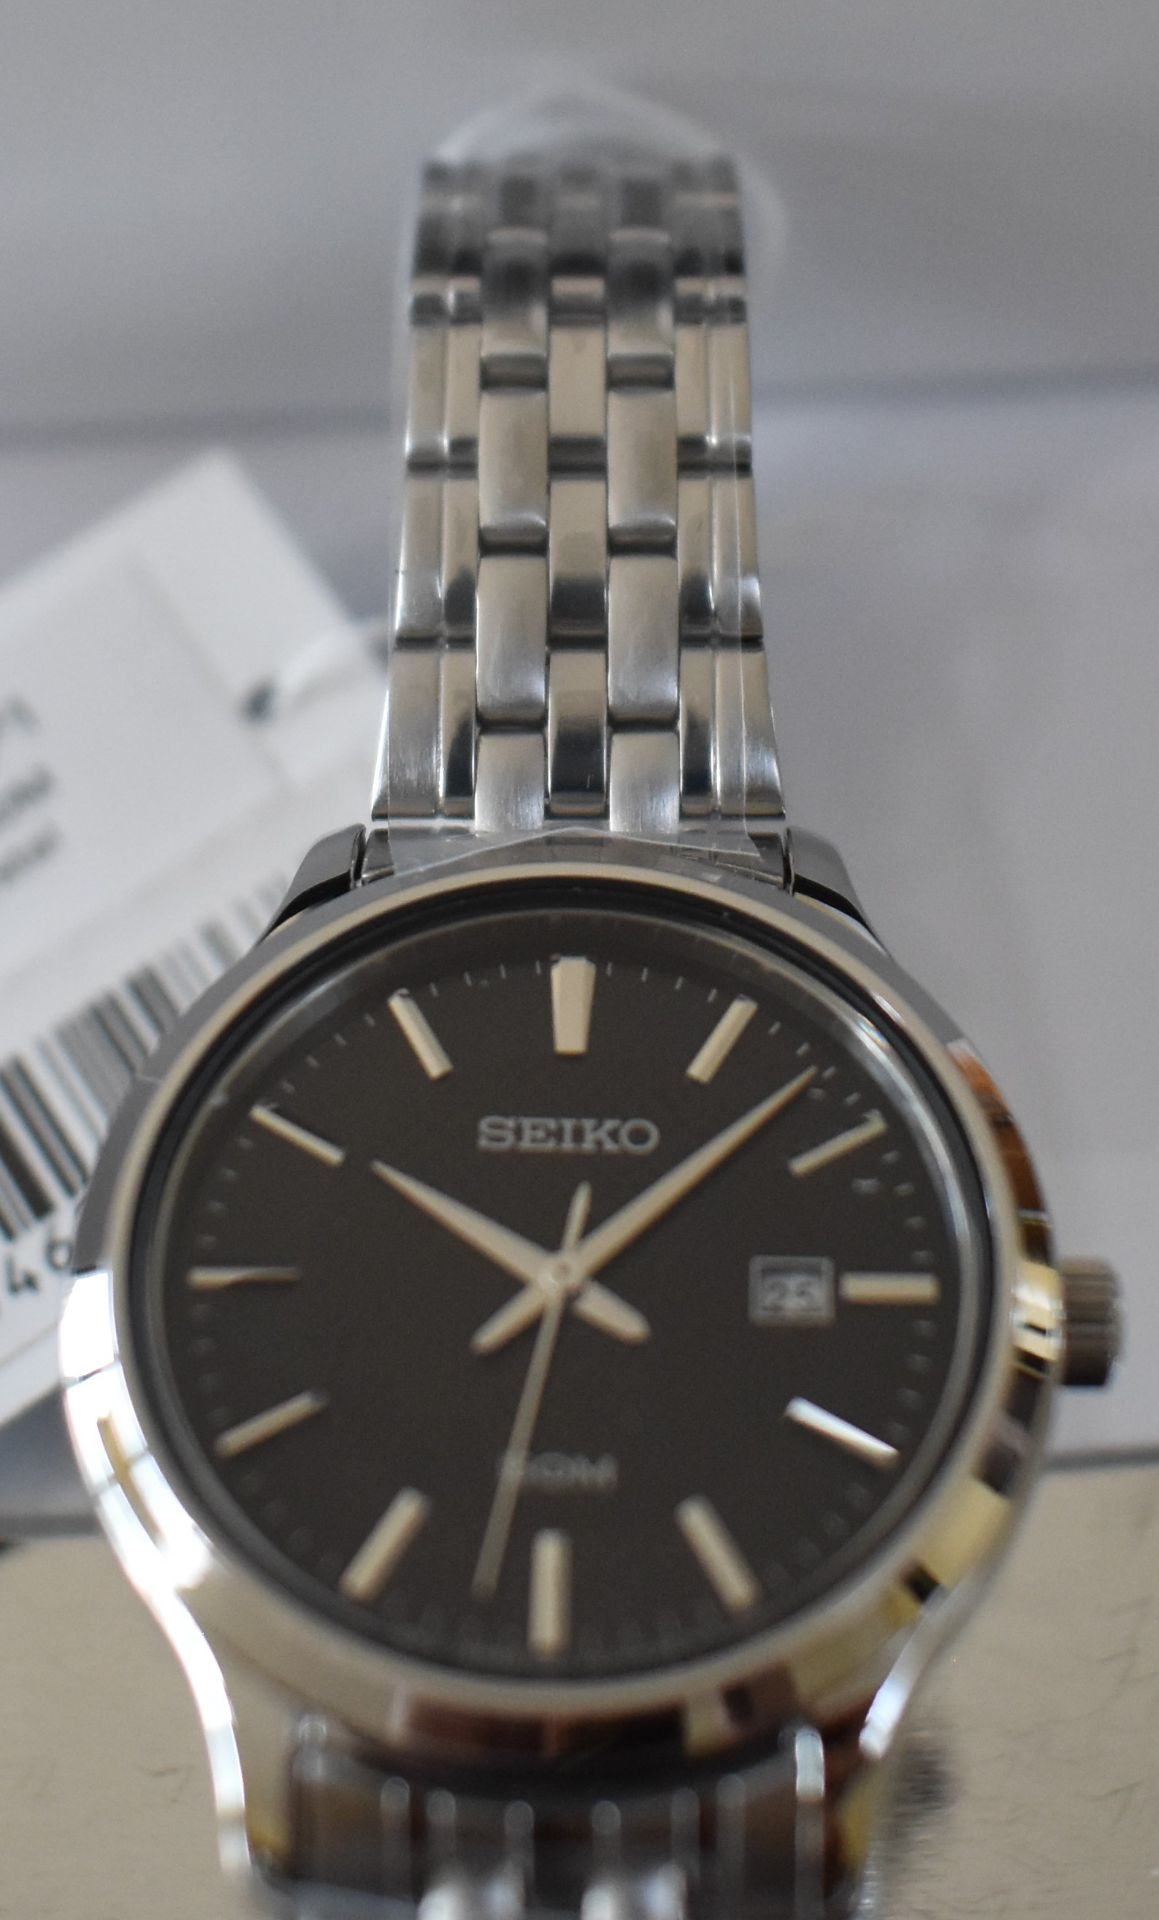 Seiko Ladies Watch SUR649P1 - Image 2 of 2